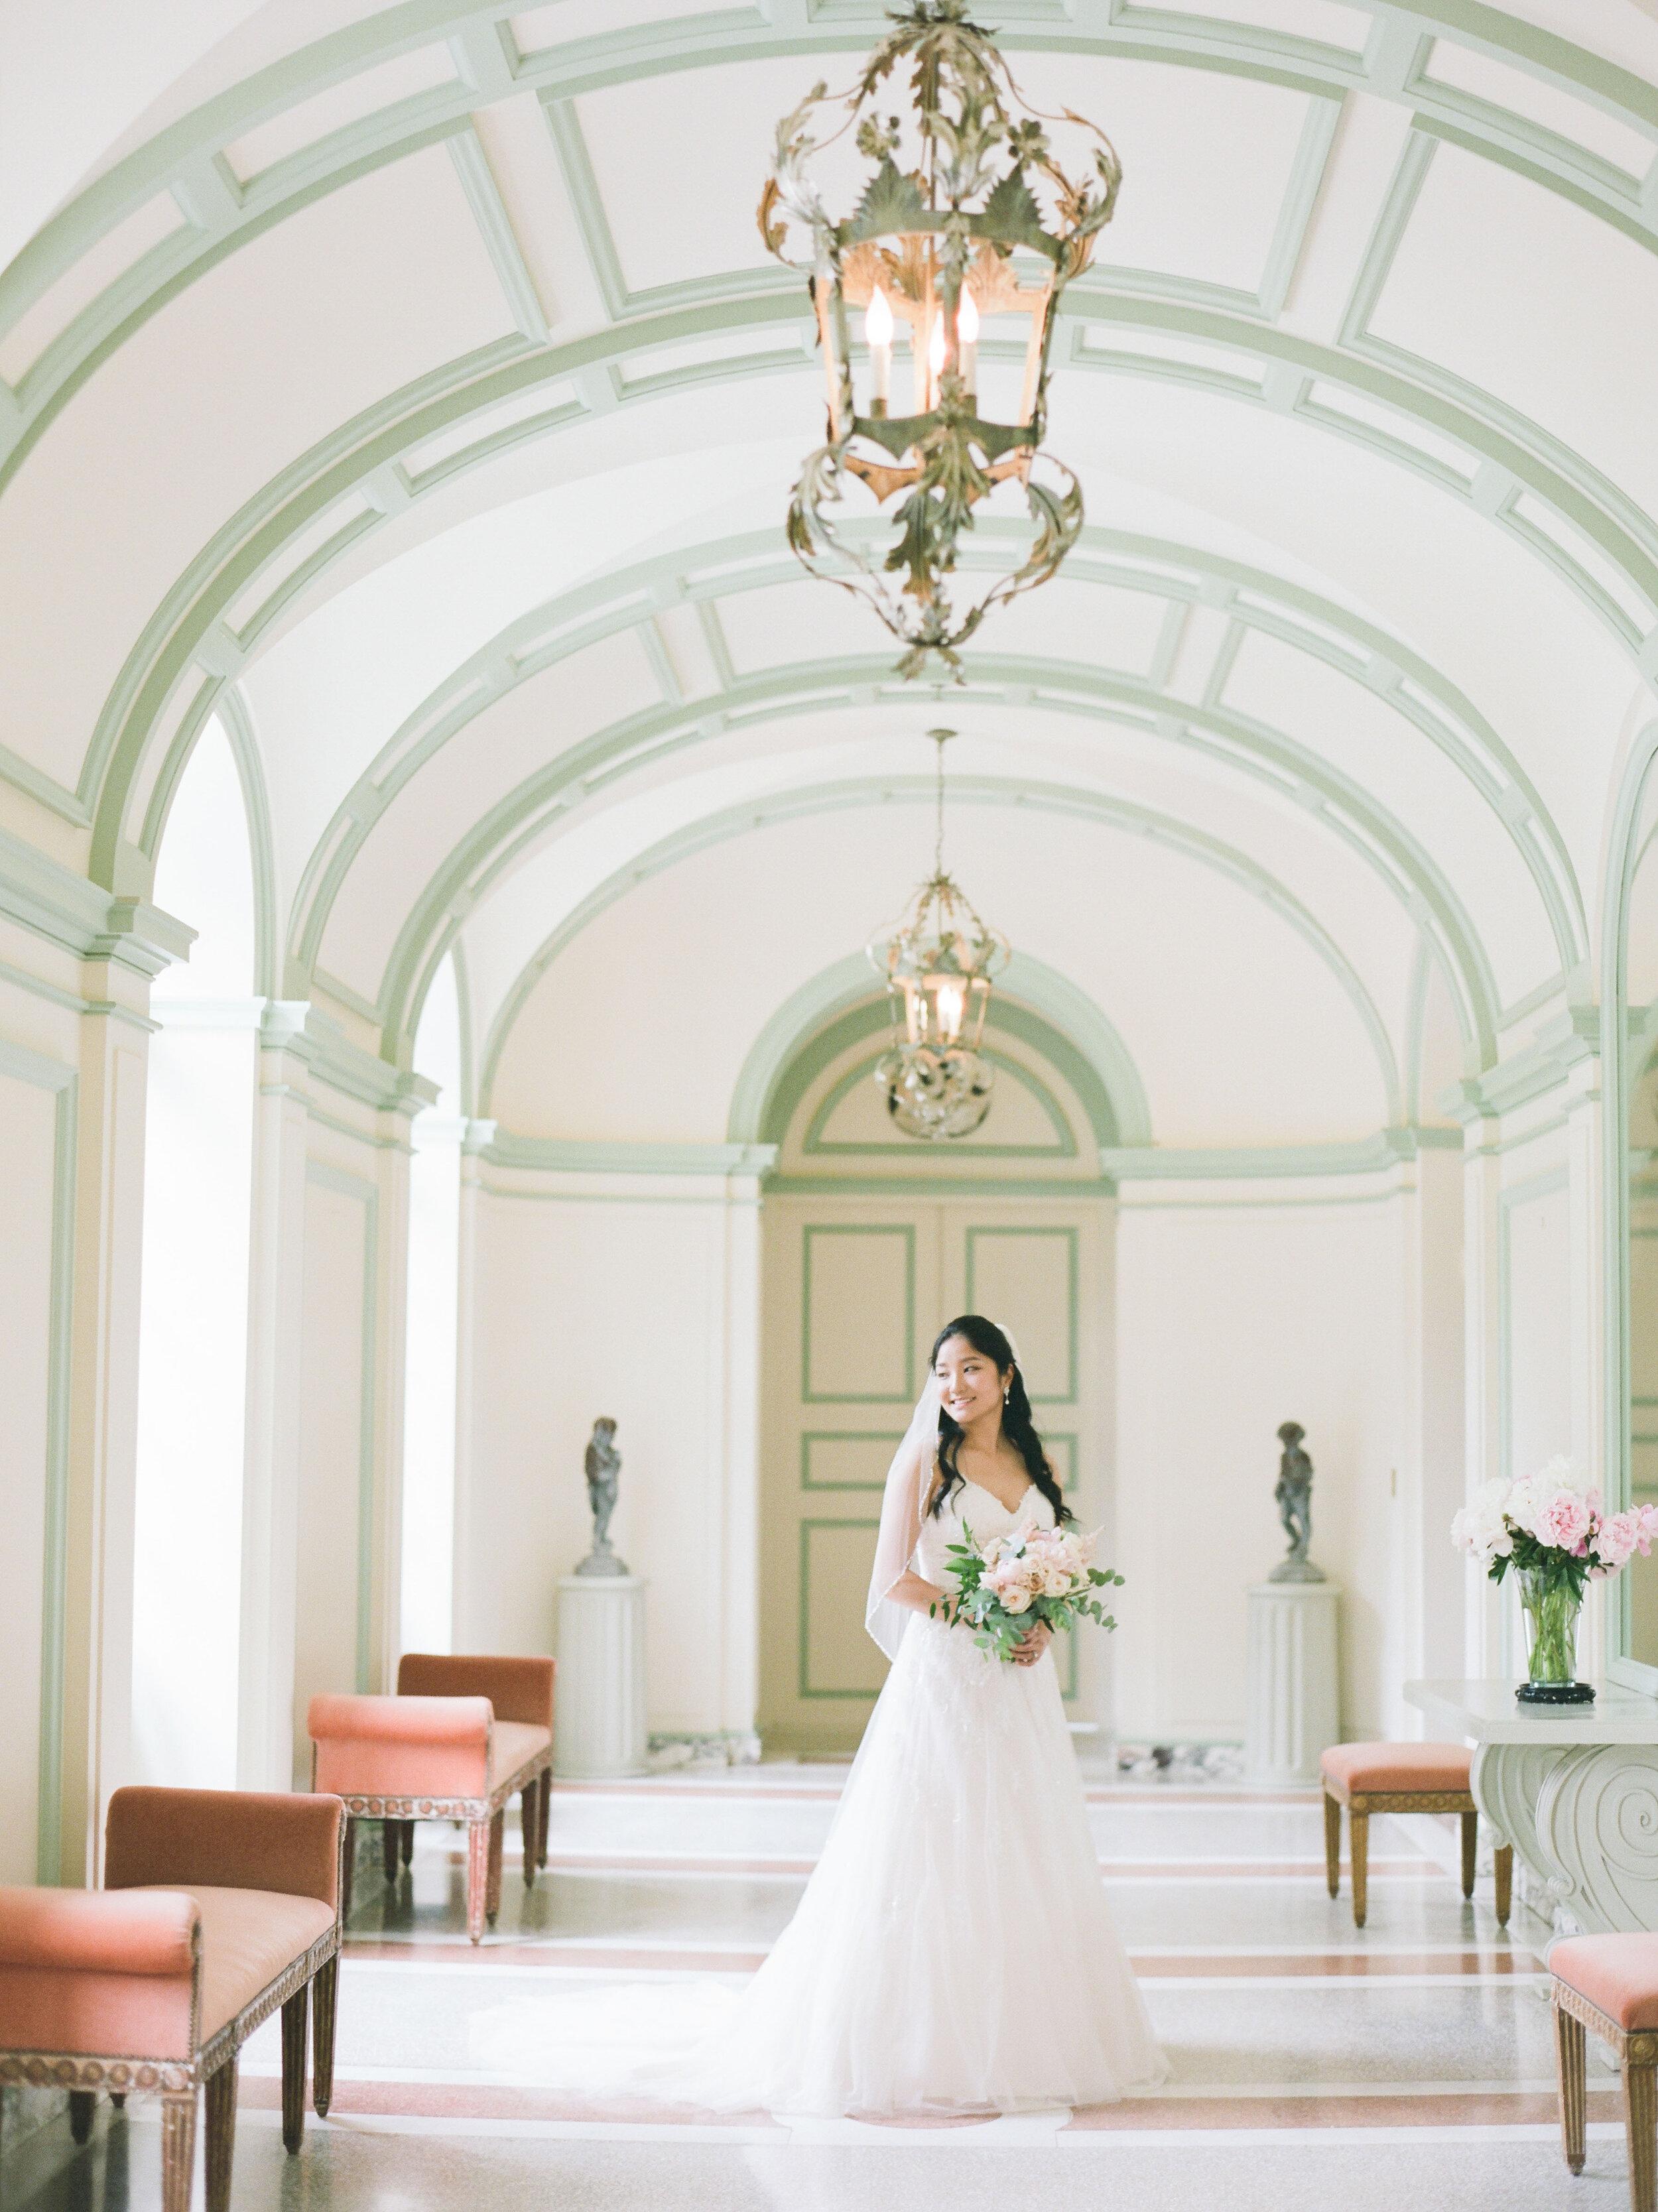 Berkshire Mass Mount Wedding Day